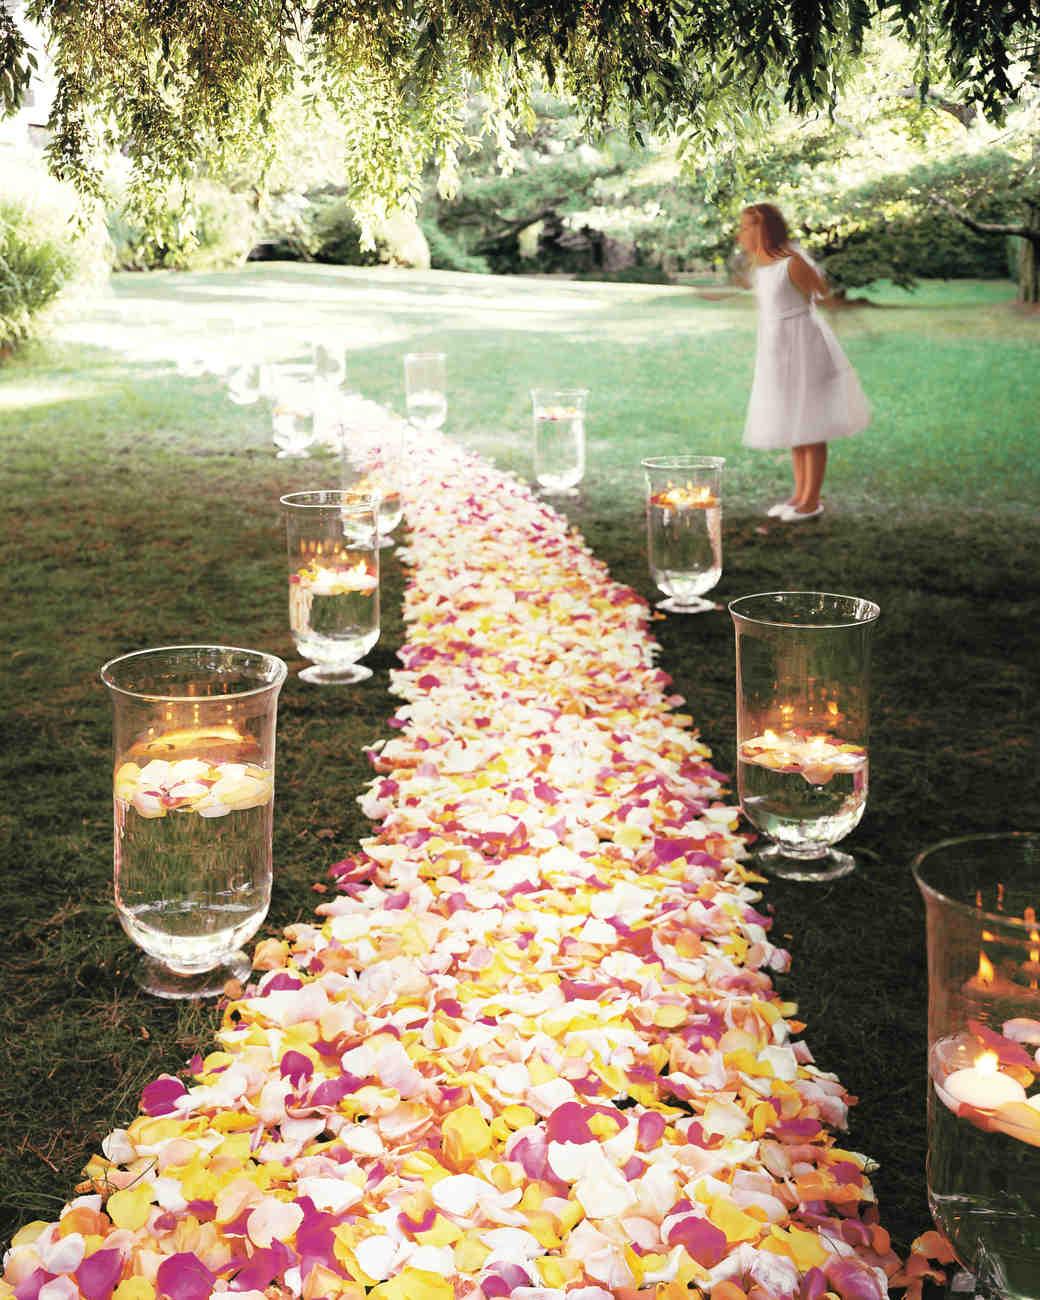 path-flower-petals-votive-candle-mml922j4.jpg